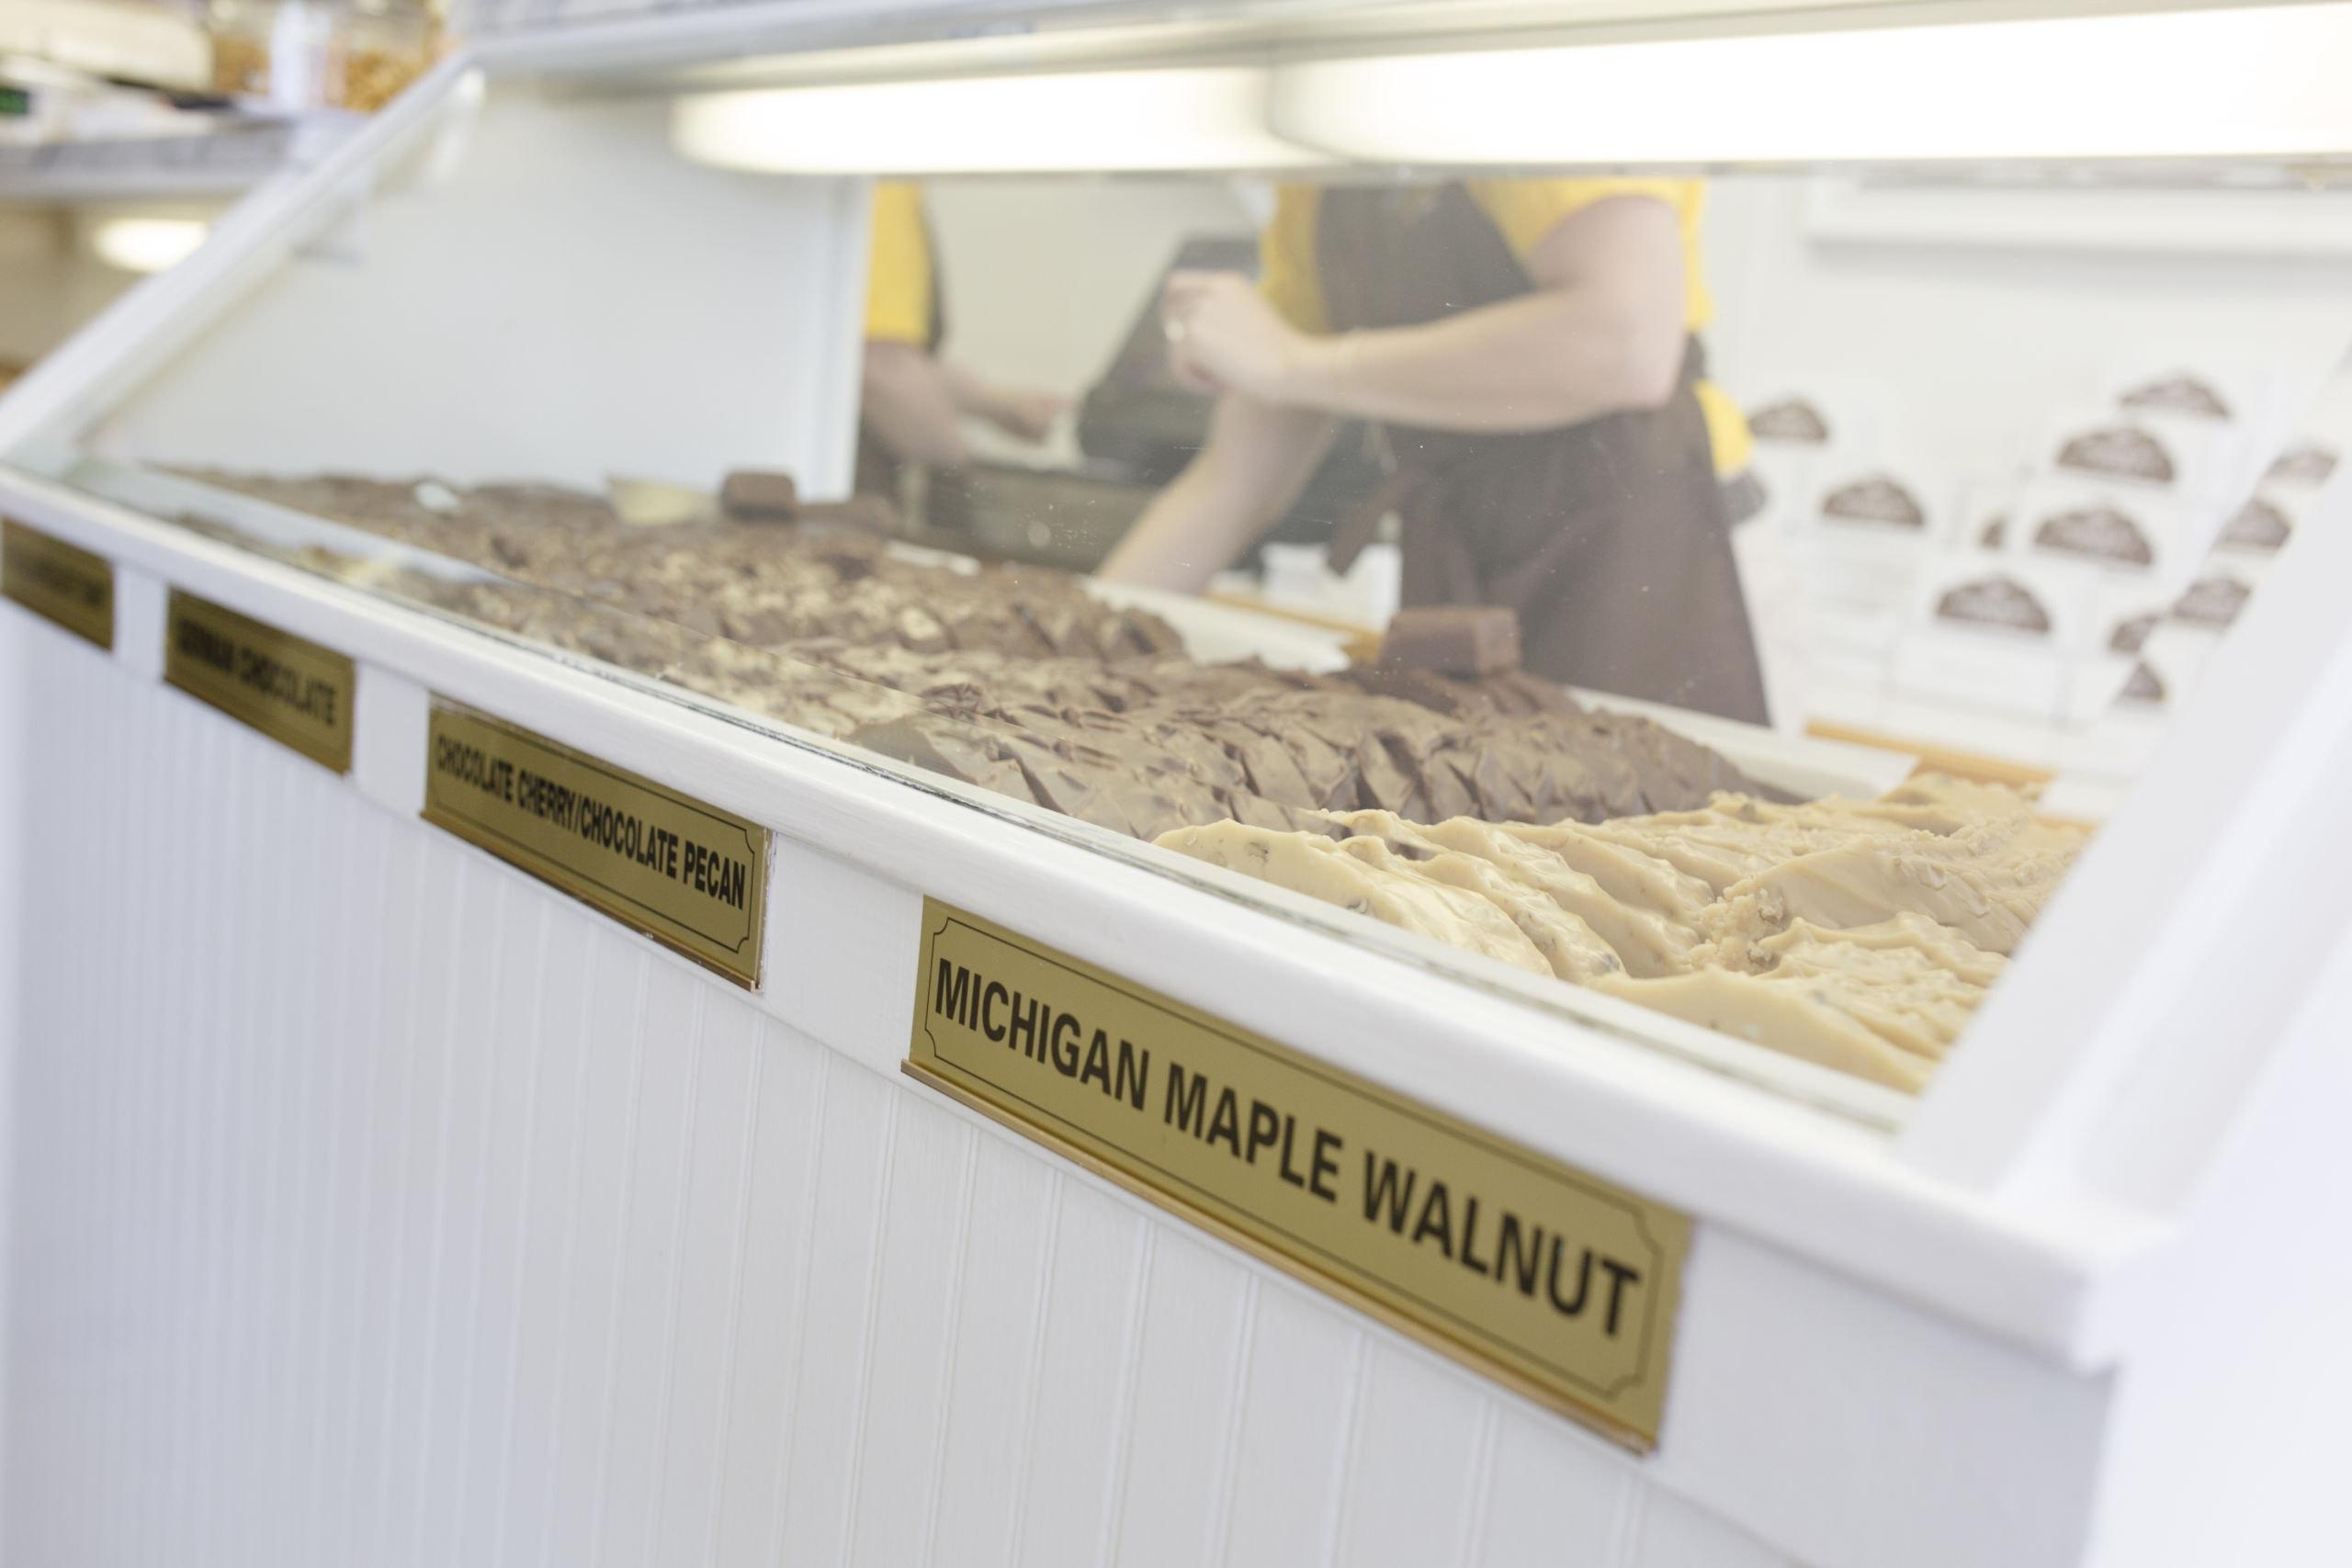 michigan maple fudge, mackinac island, murdick's fudge, fudge shop